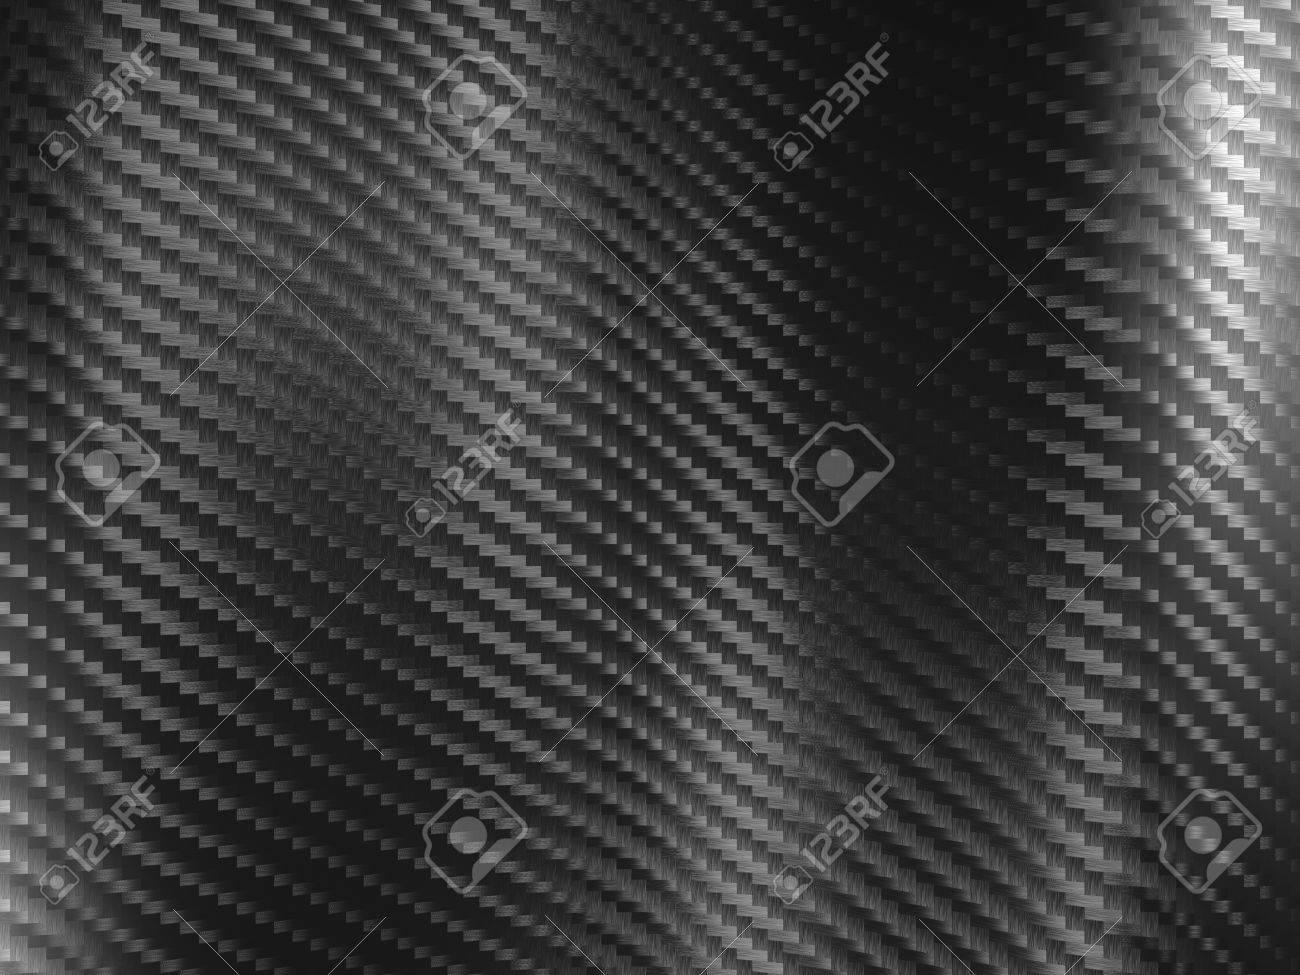 3d image of classic carbon fiber texture - 49099556